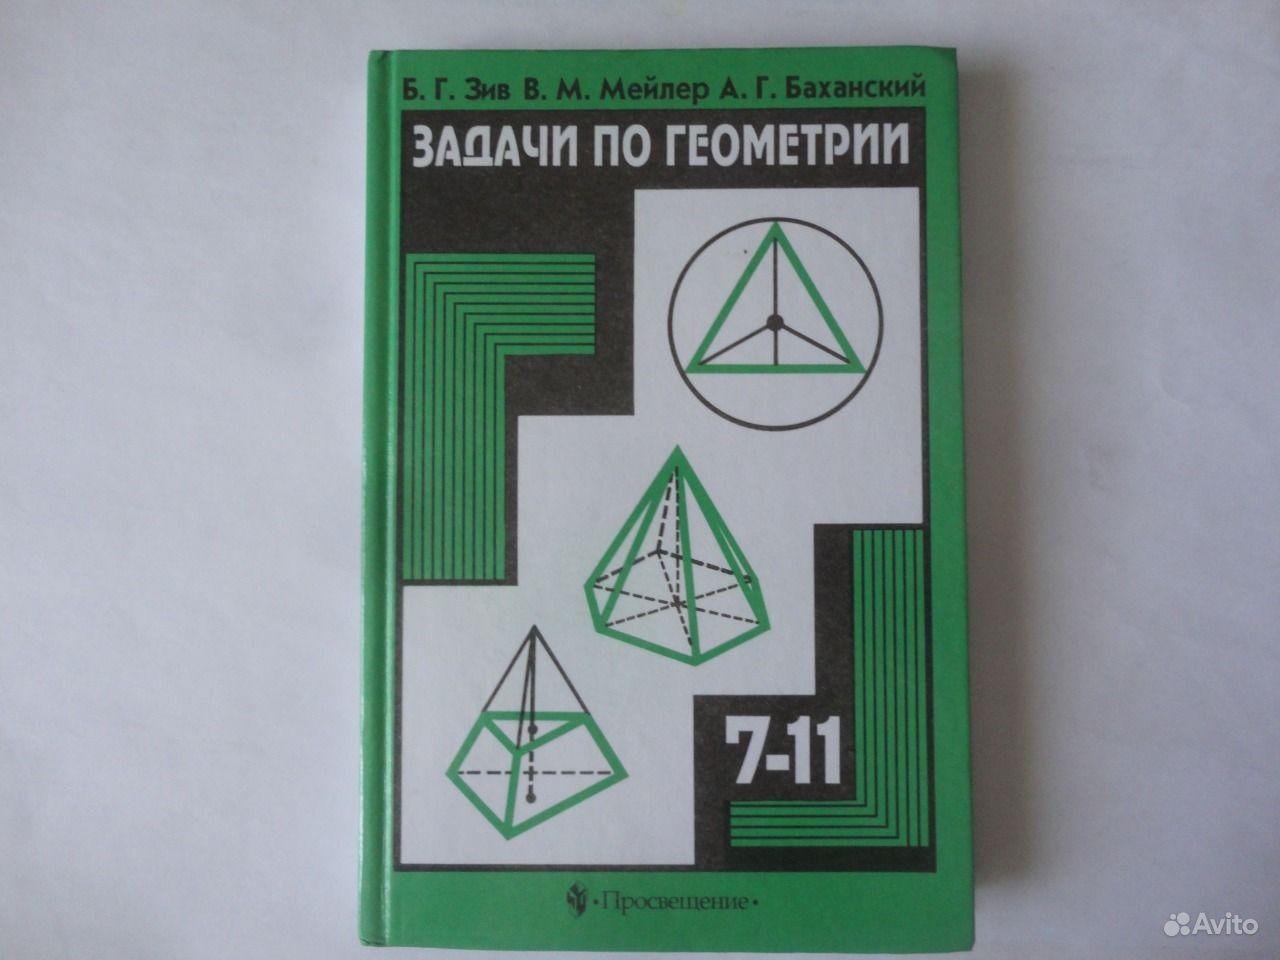 геометрии по класс геометрии задачи по 7-11 7 баханский решебник